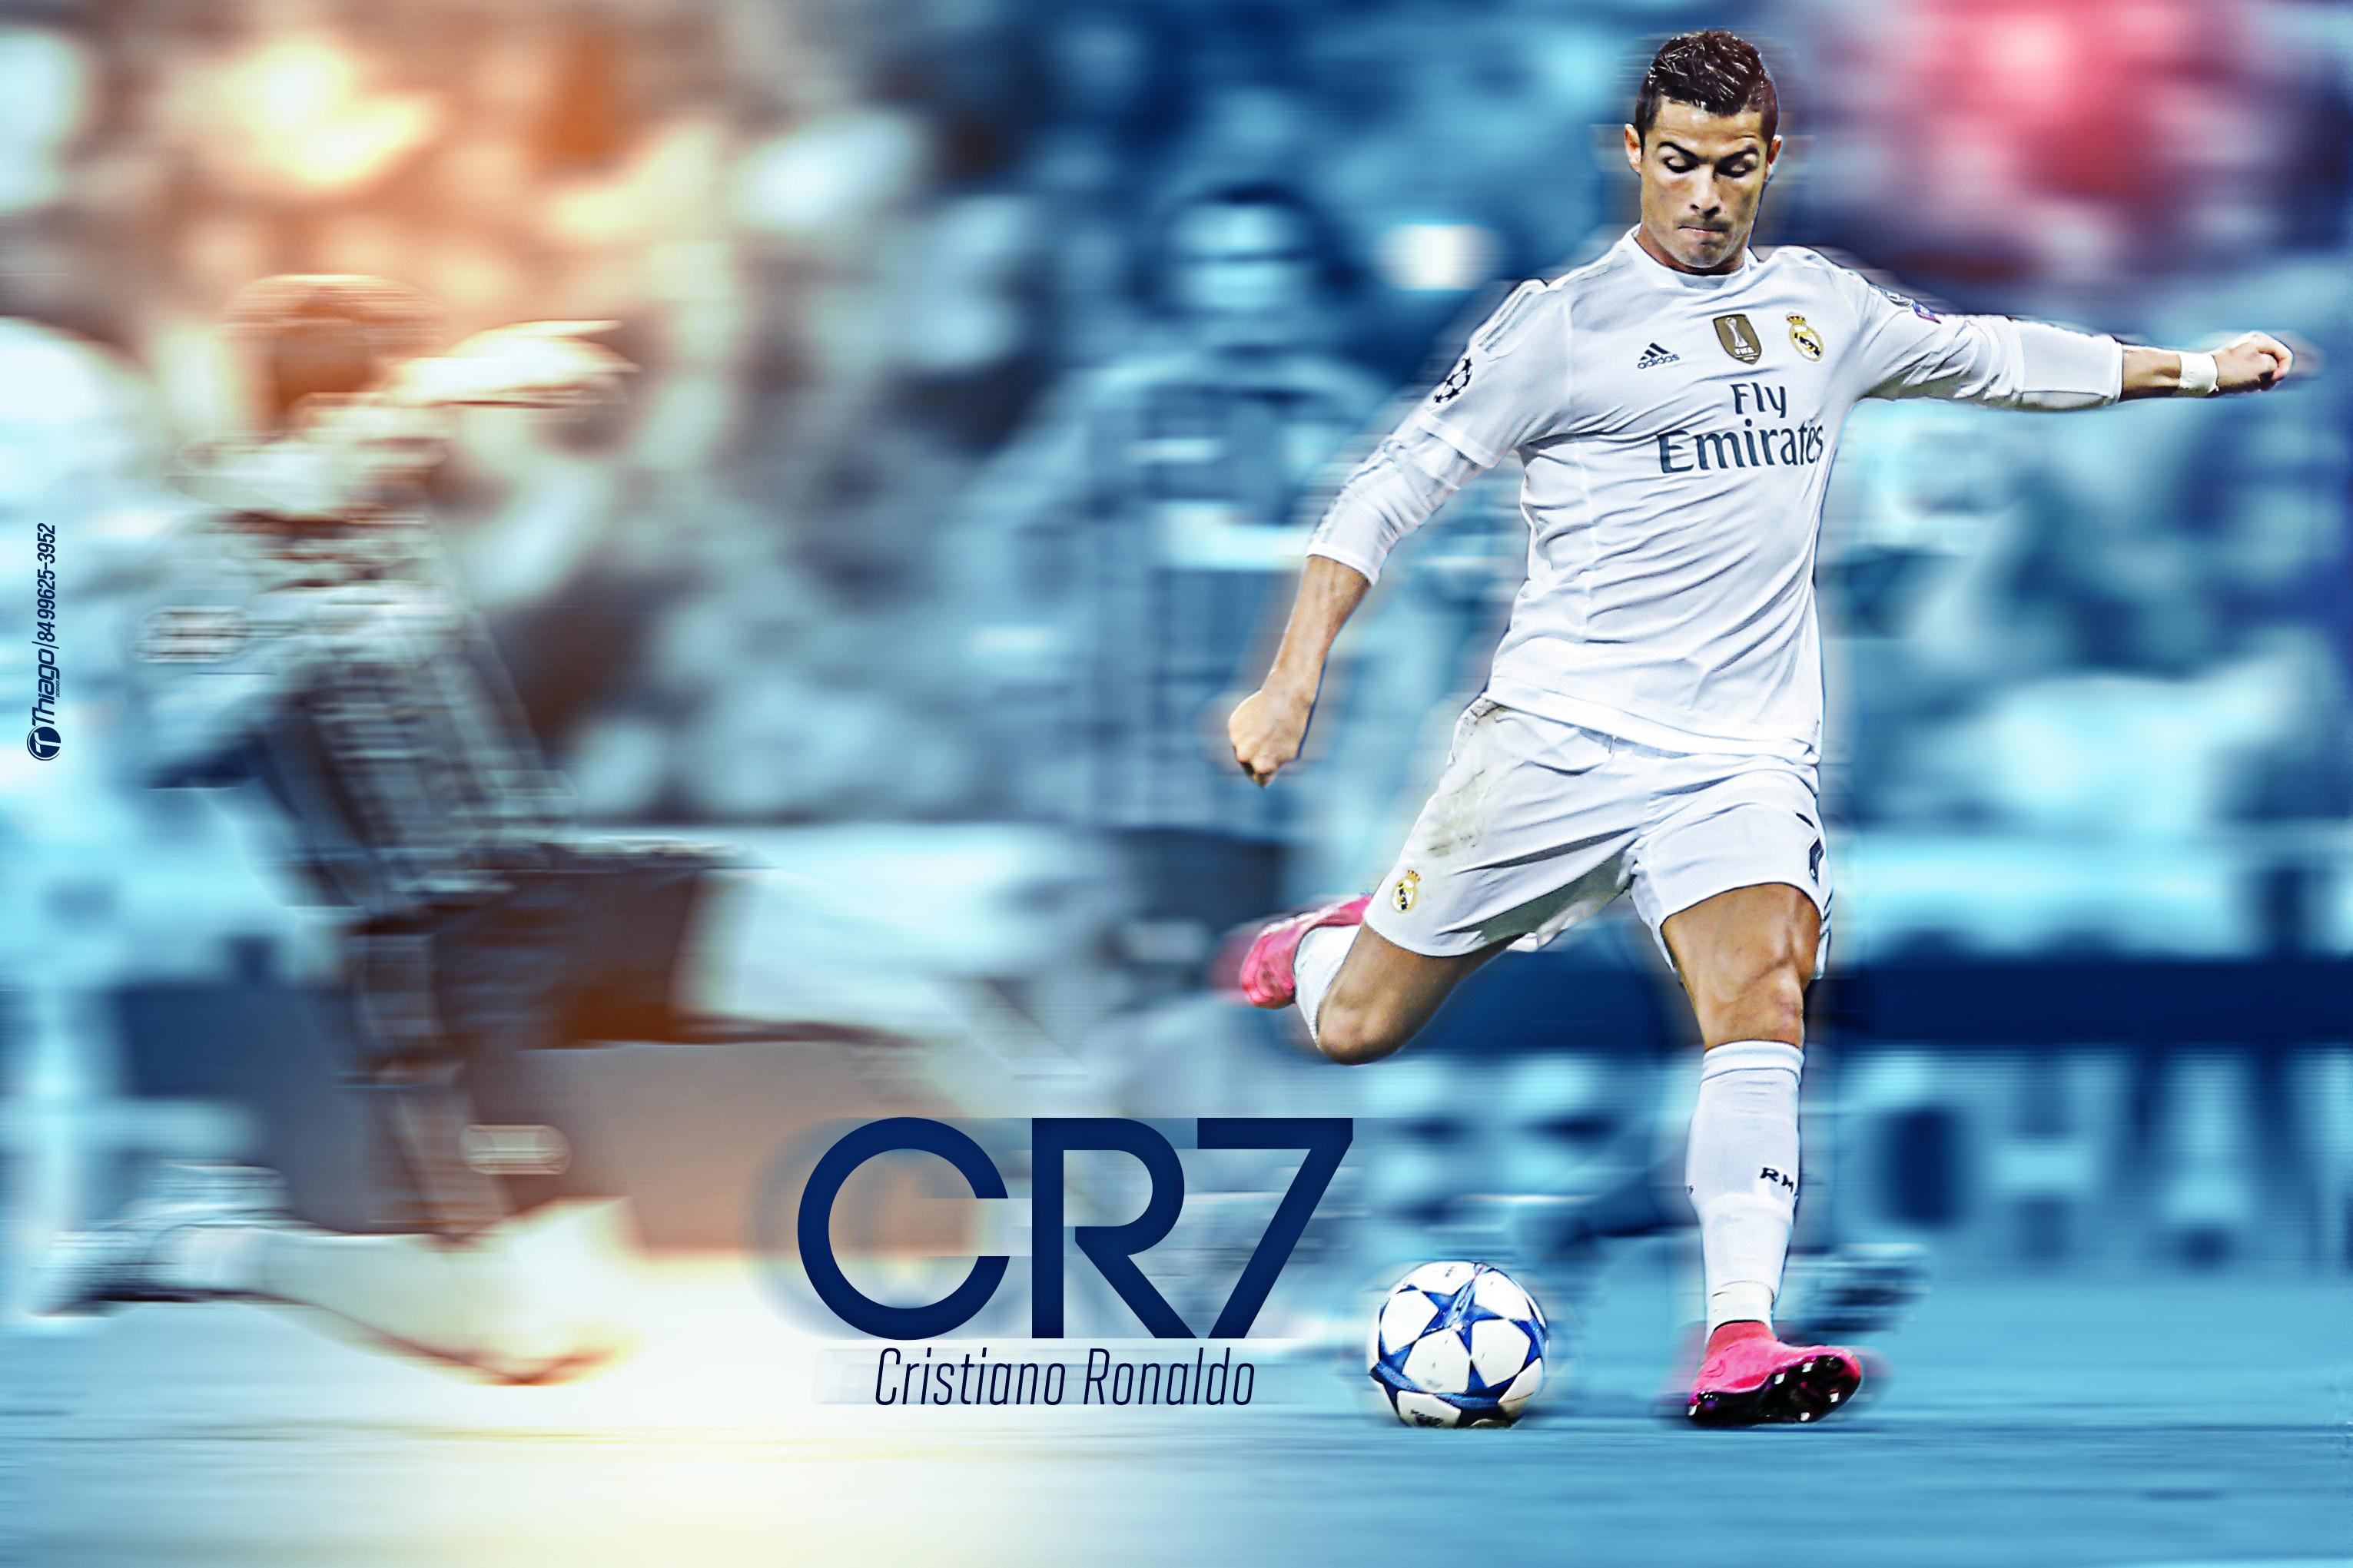 real madrid football star cristiano ronaldo full hd wallpaper